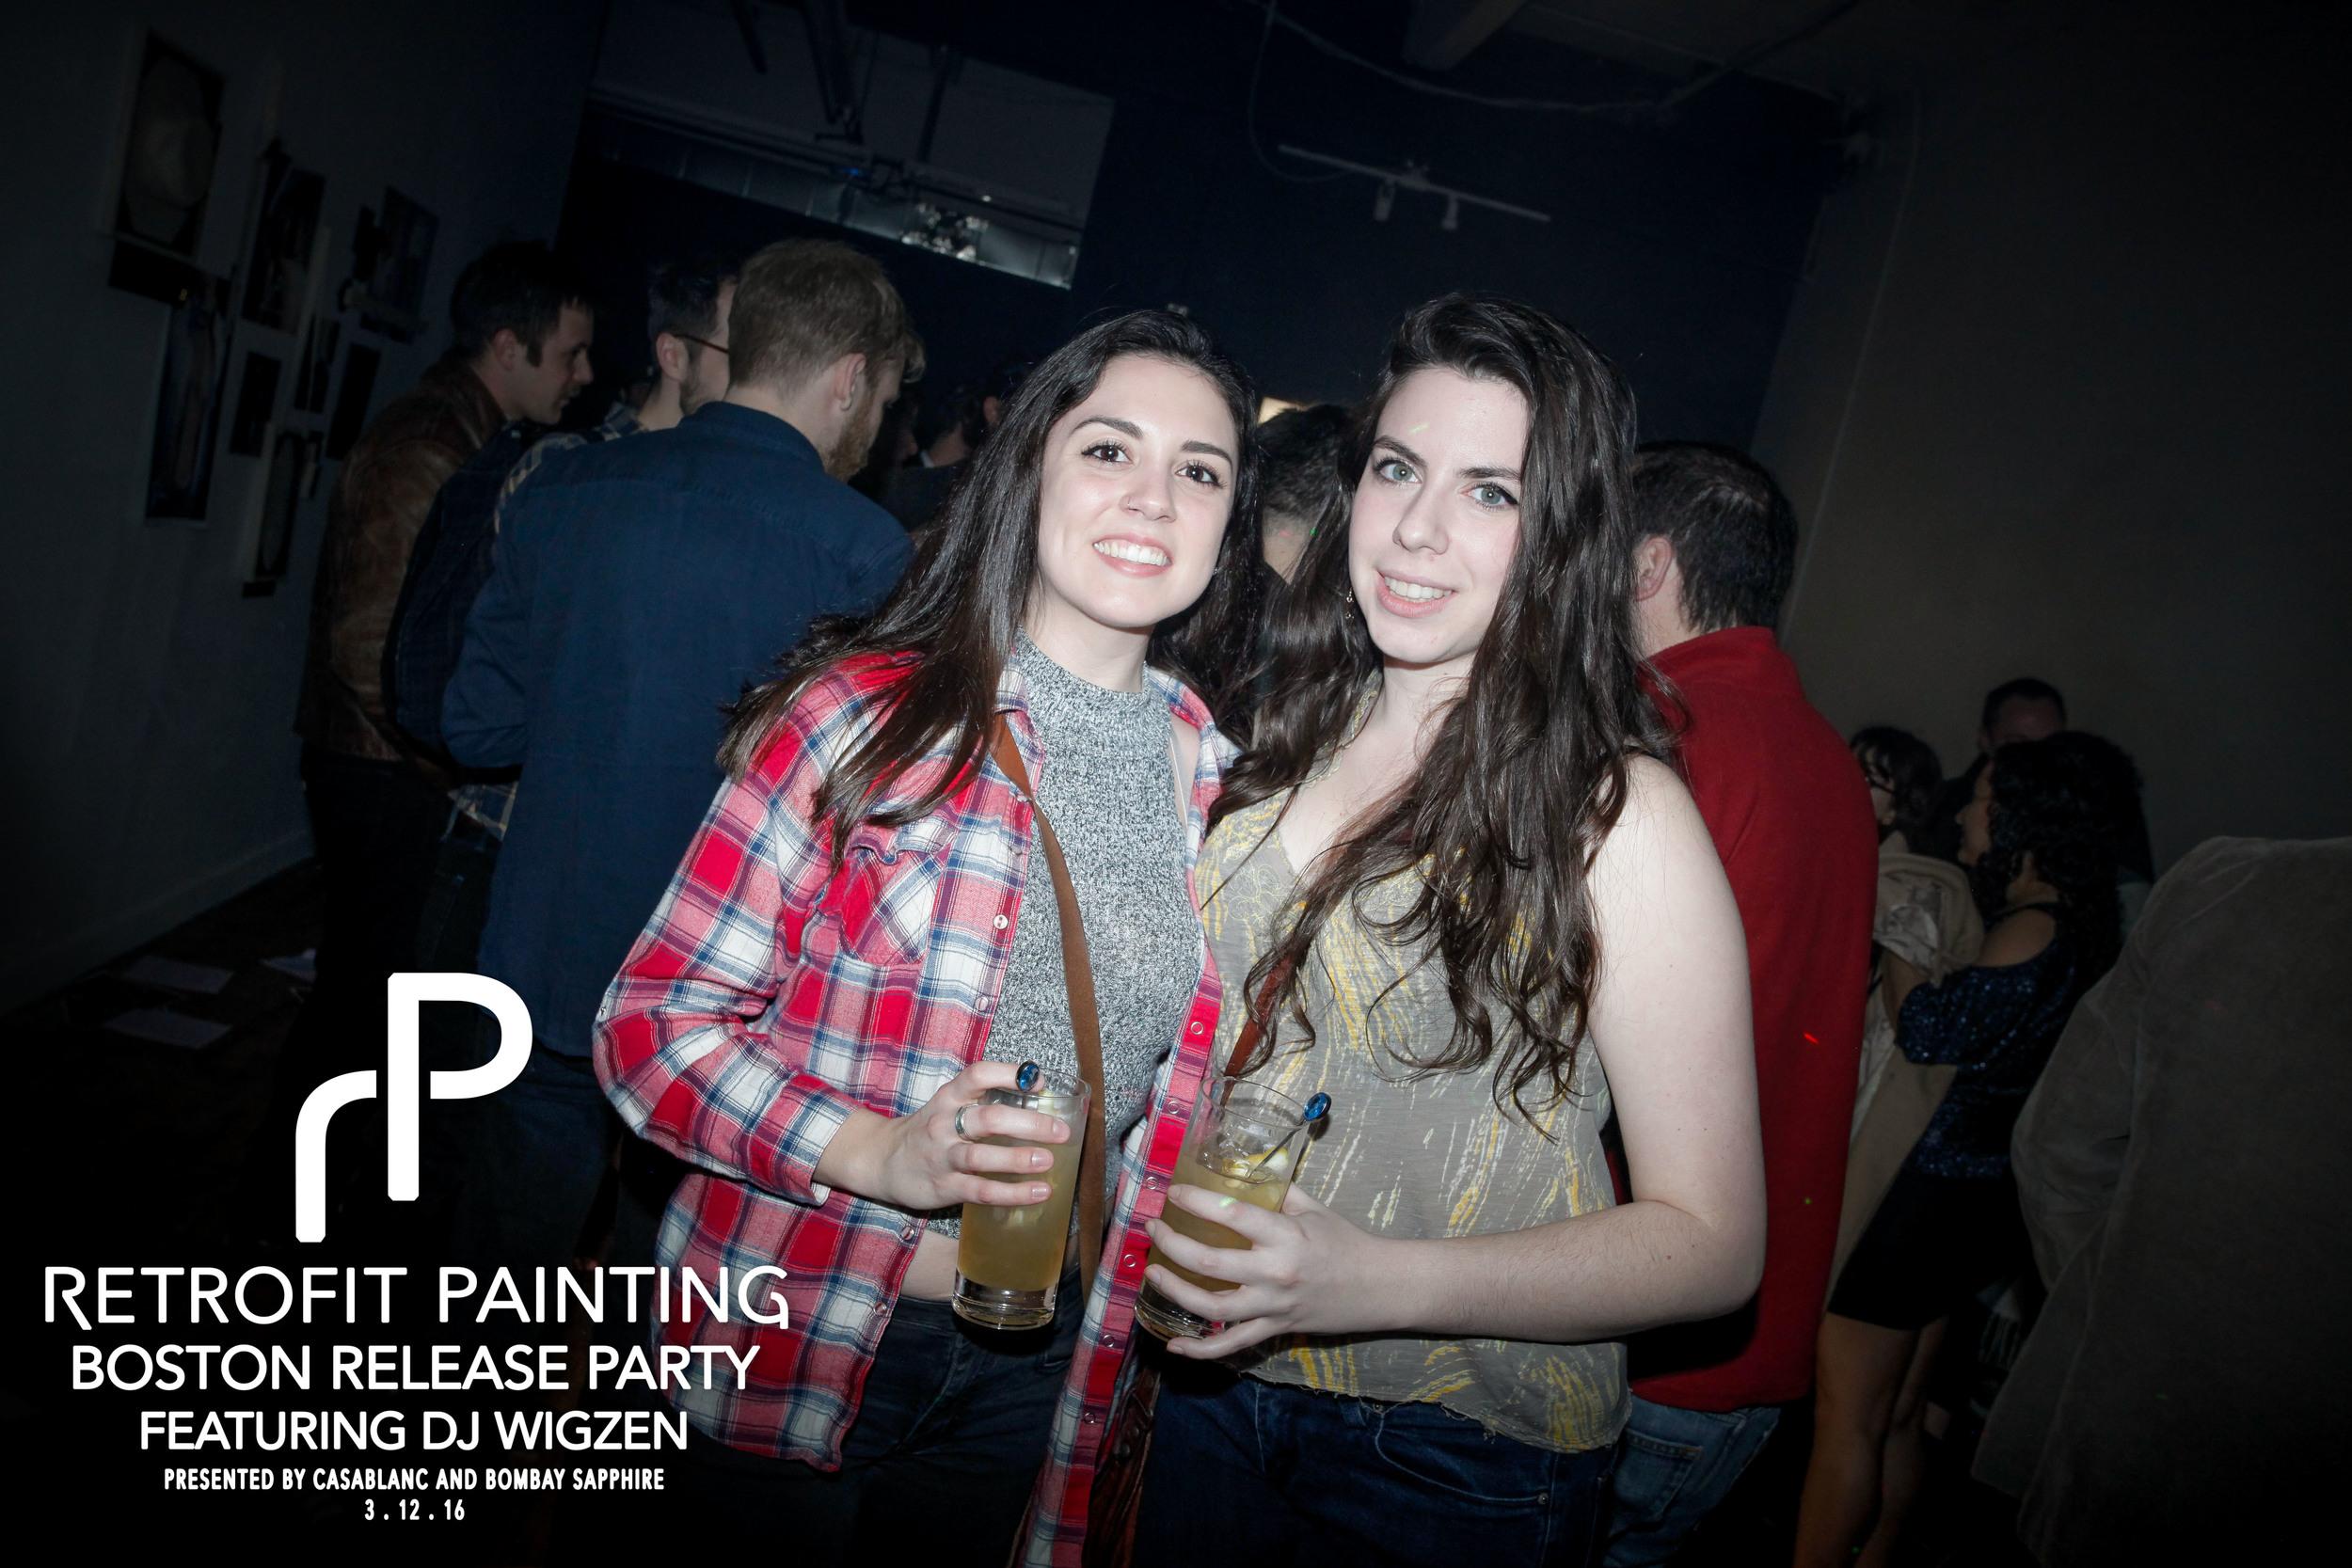 Retrofit Painting Boston Release Party 0023.jpg